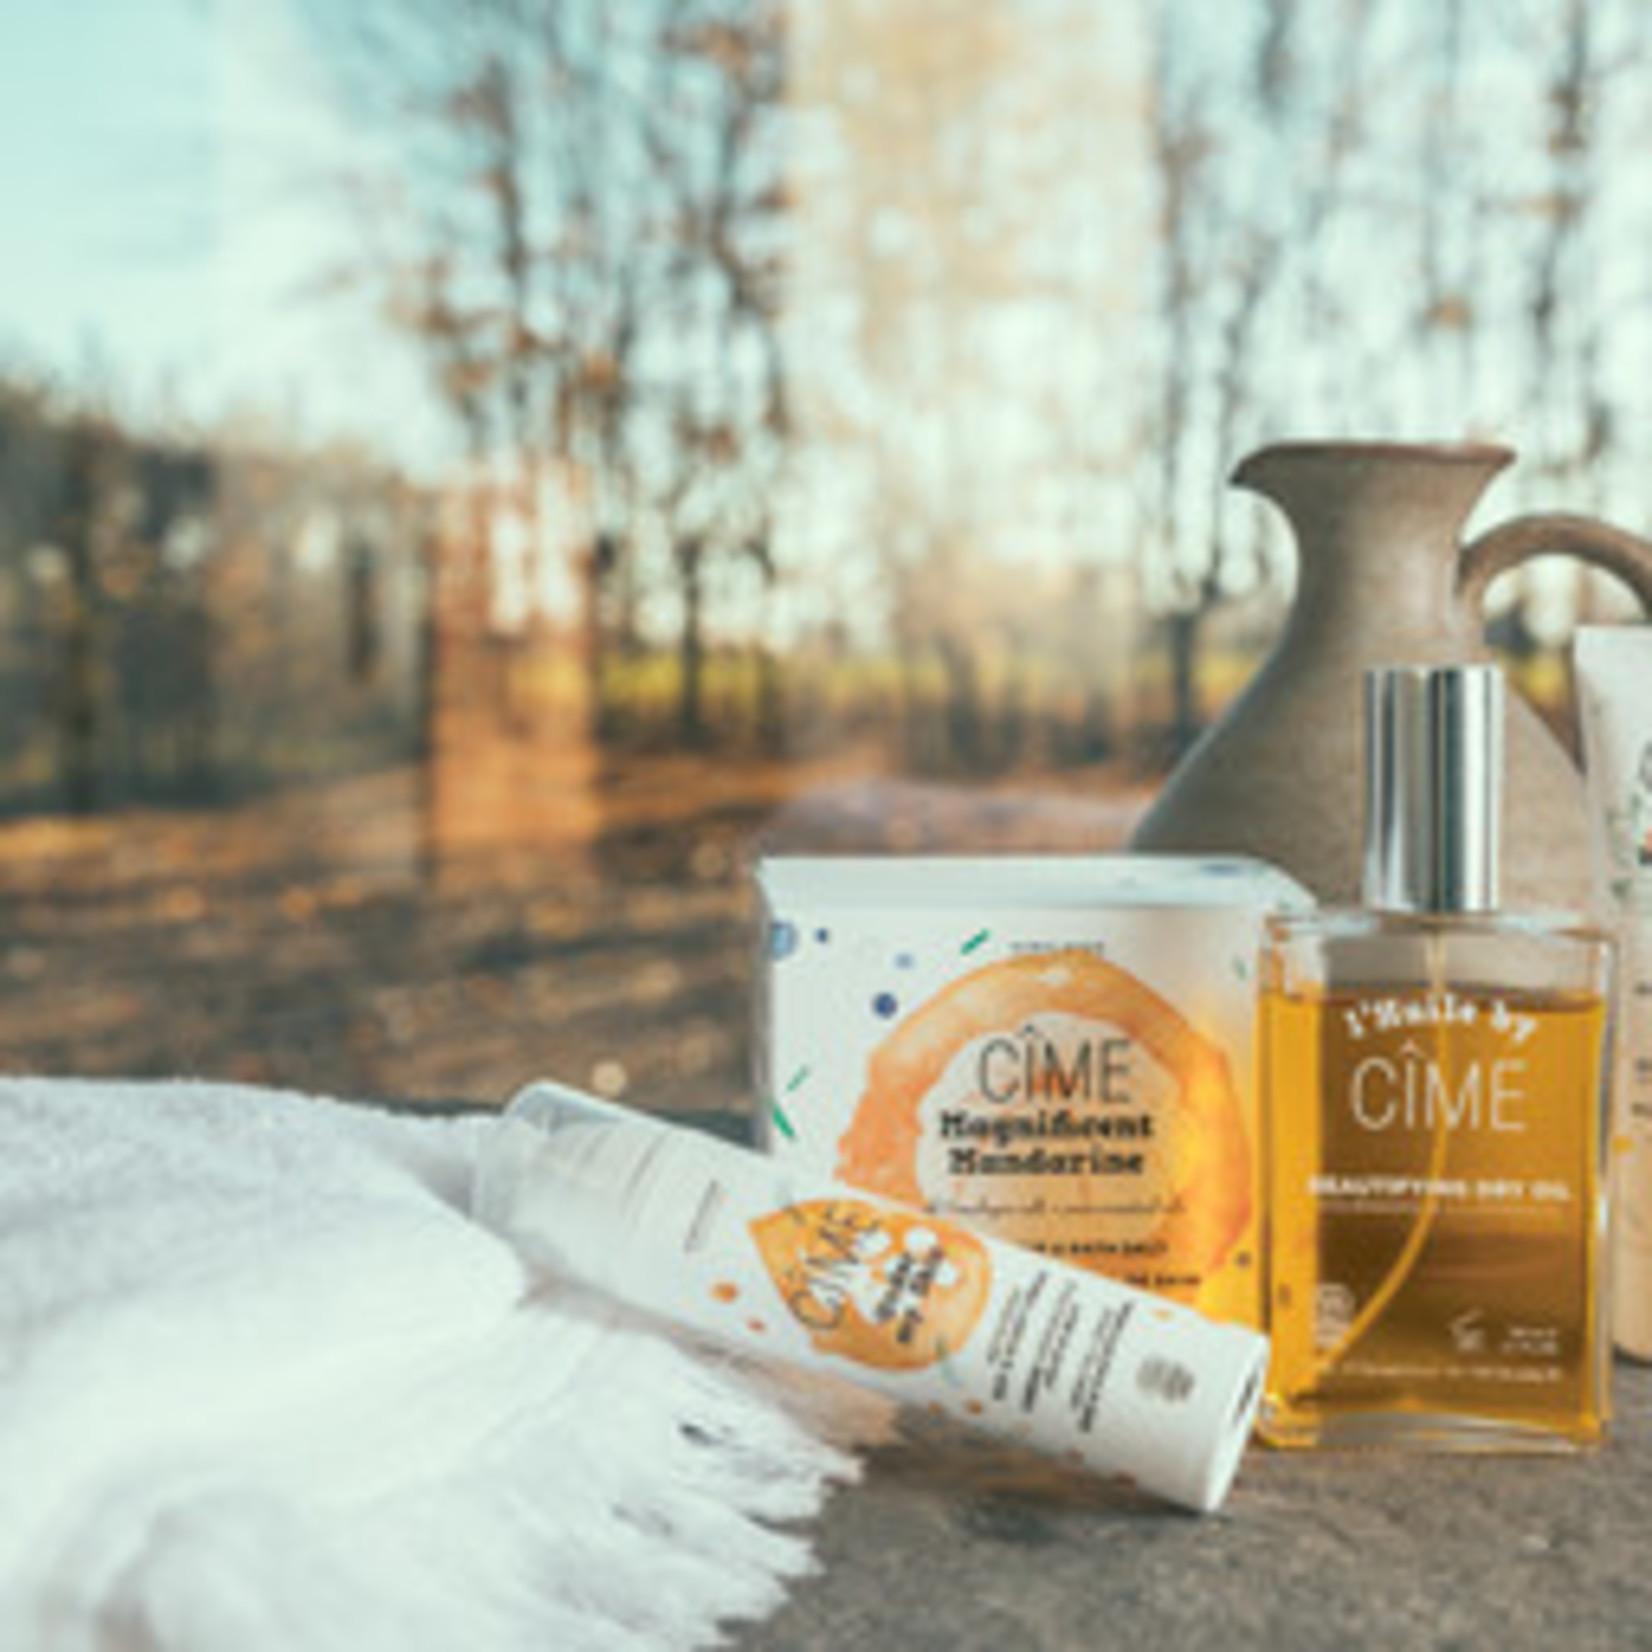 Cîme Multifunctionele droge olie - l'Huile by Cîme